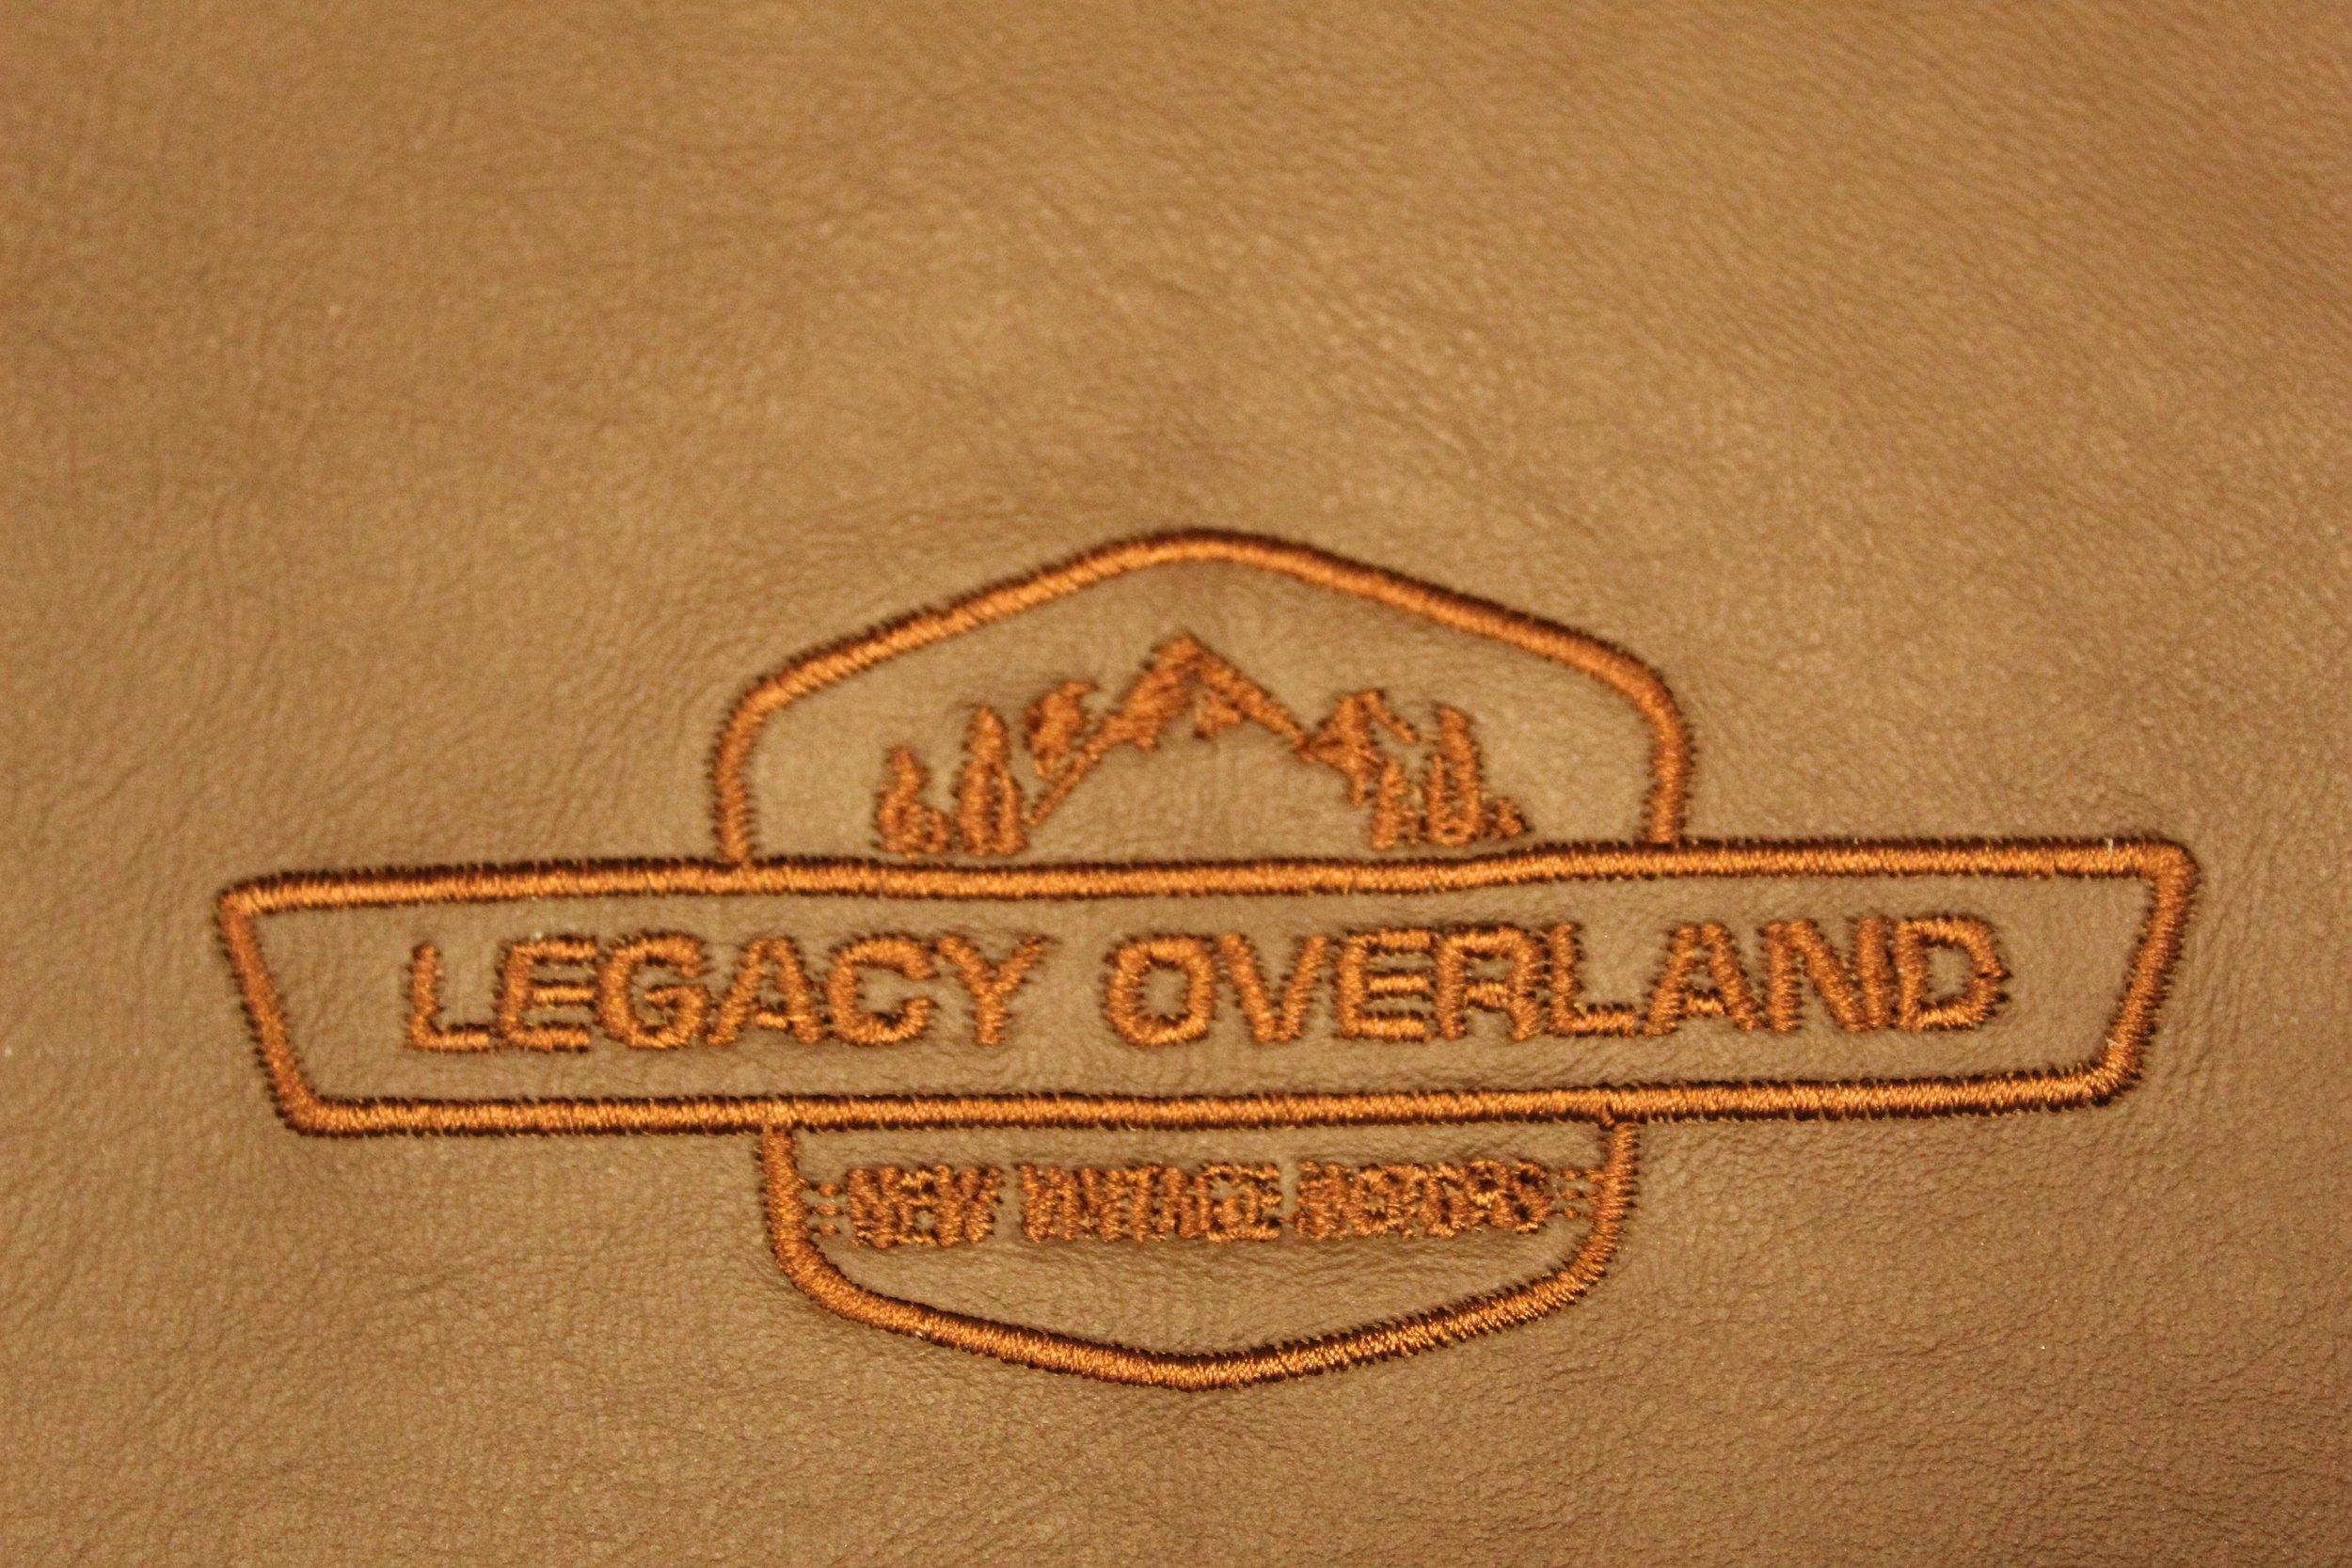 LegacyOverland_Olympic_buildphotos_499.JPG